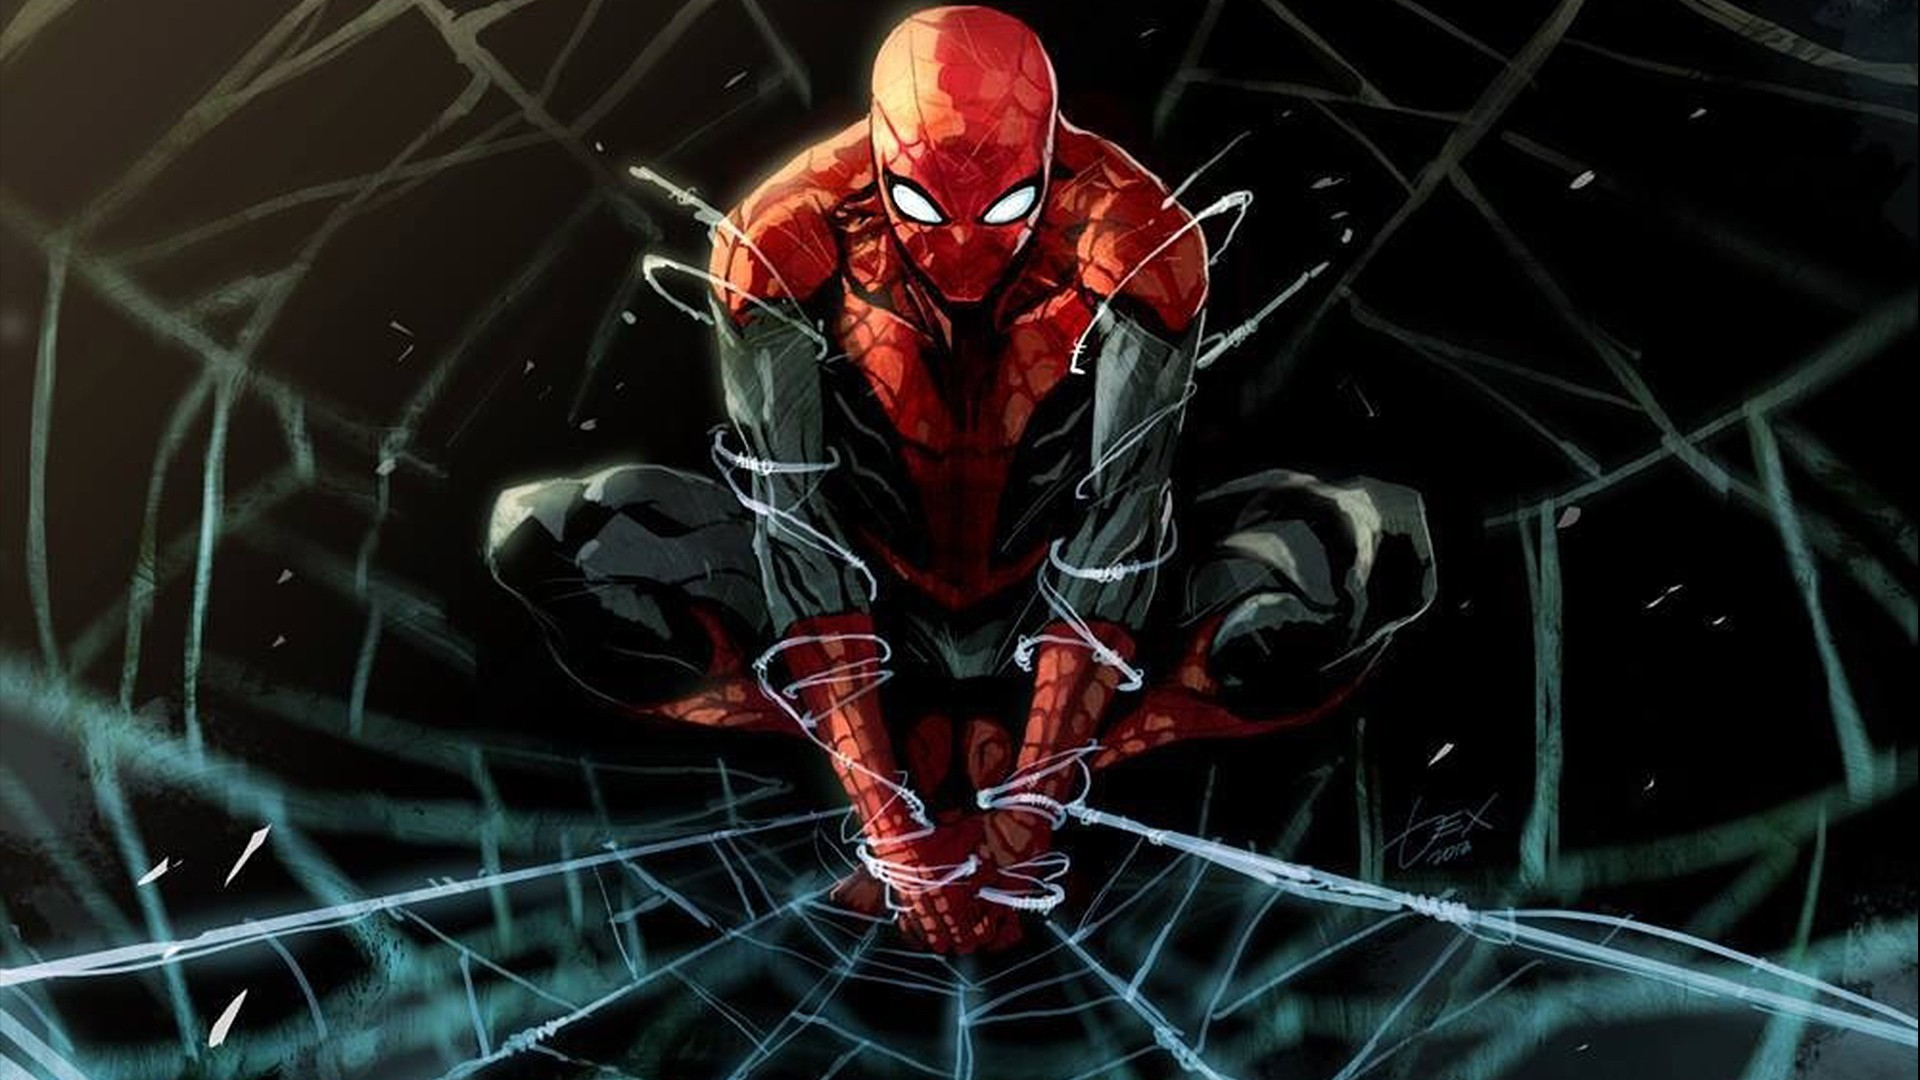 Spider man wallpaper download free stunning full hd - Iron man spiderman wallpaper ...